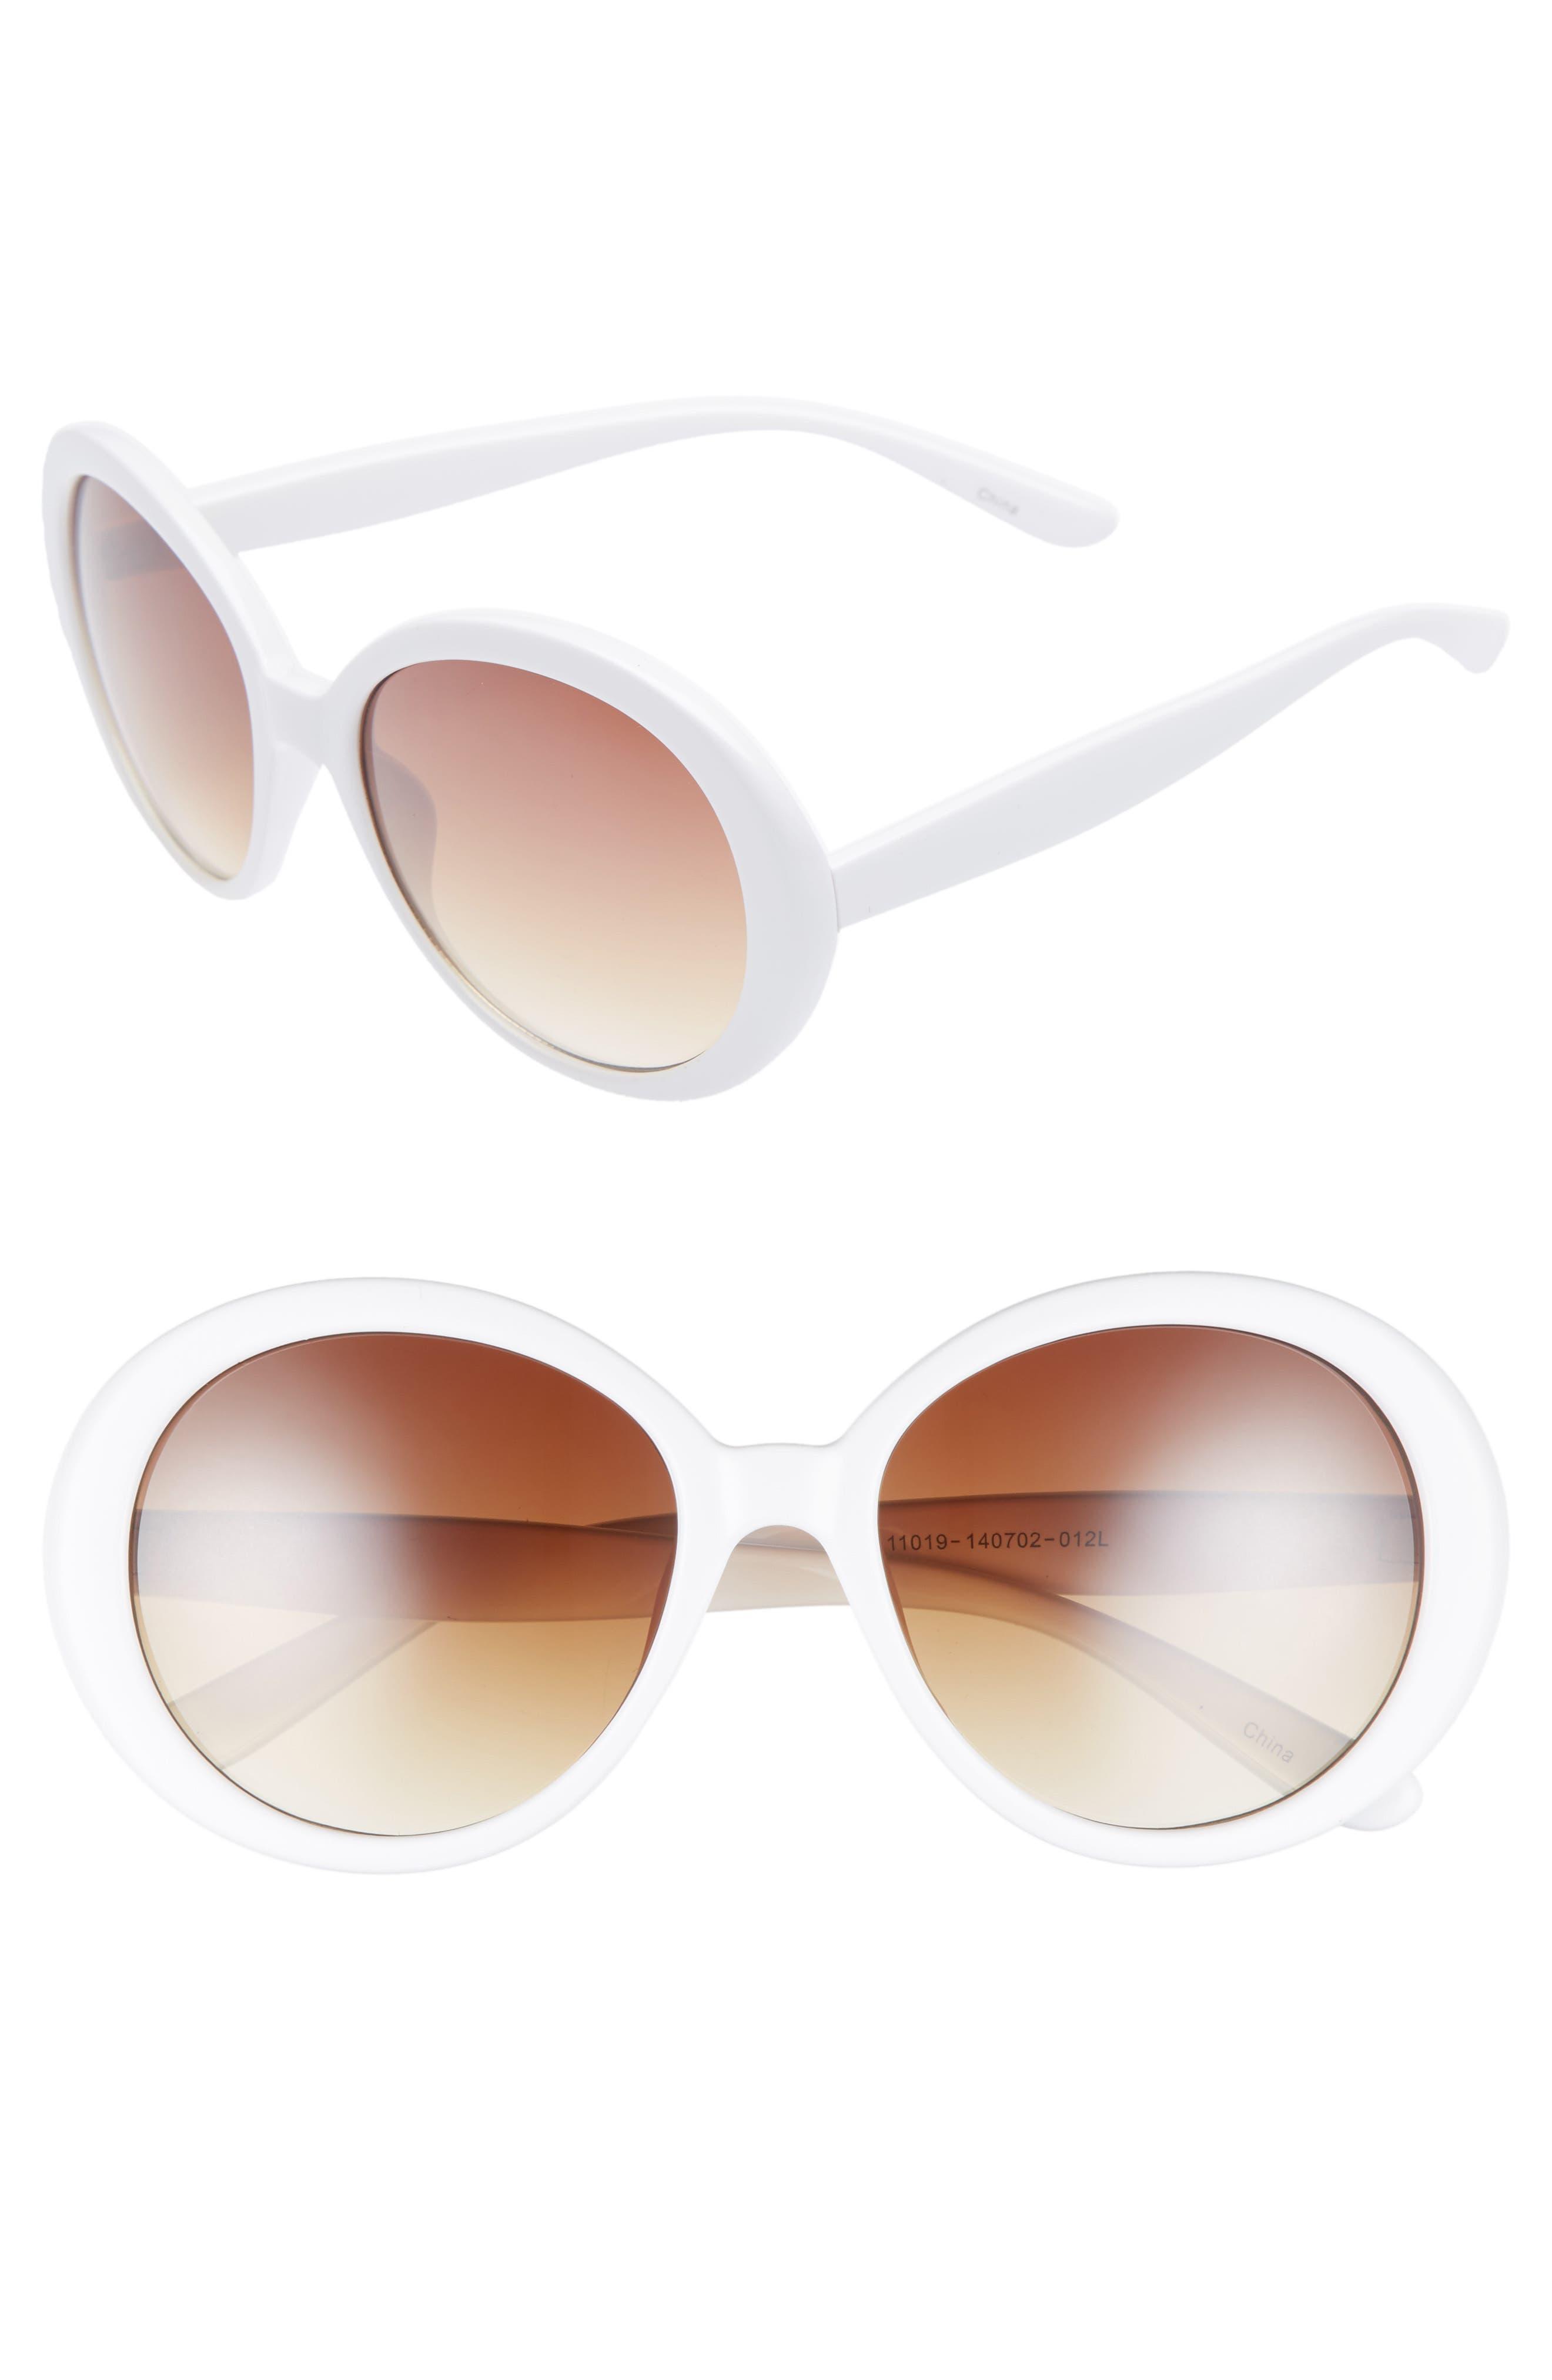 55mm Oval Sunglasses,                         Main,                         color, Cream/ Brown